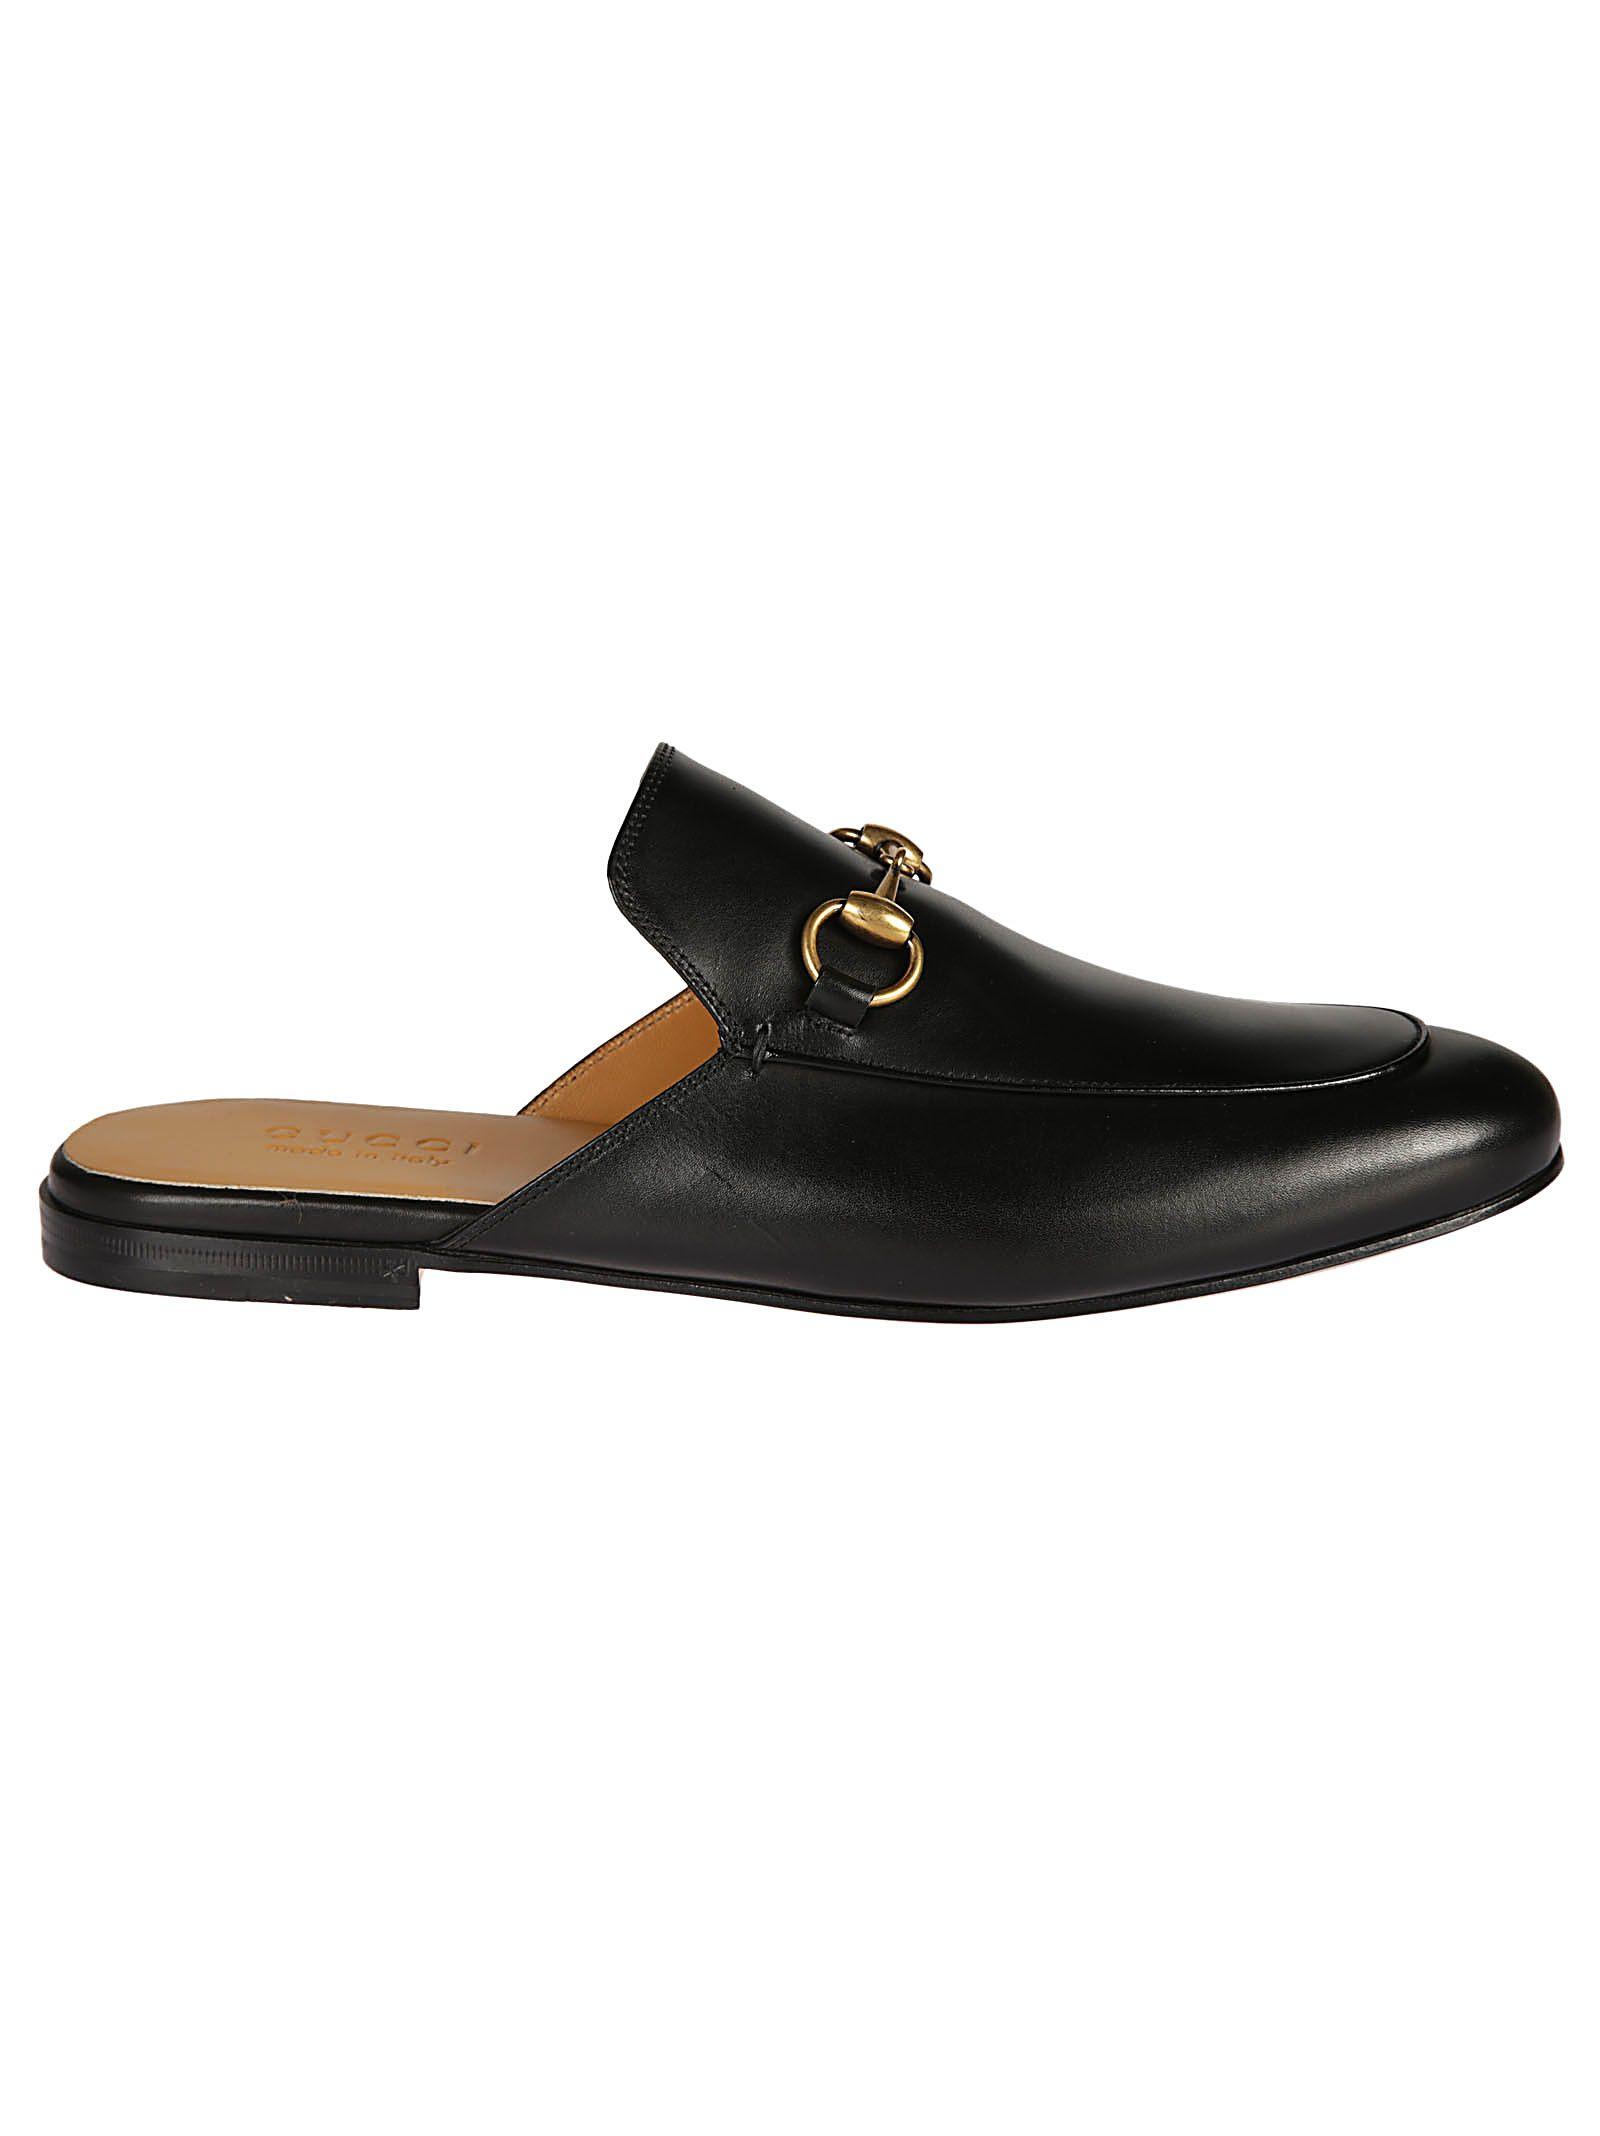 bf4ff84334f2 Gucci Gucci Horsebit Slippers - black - 10513126